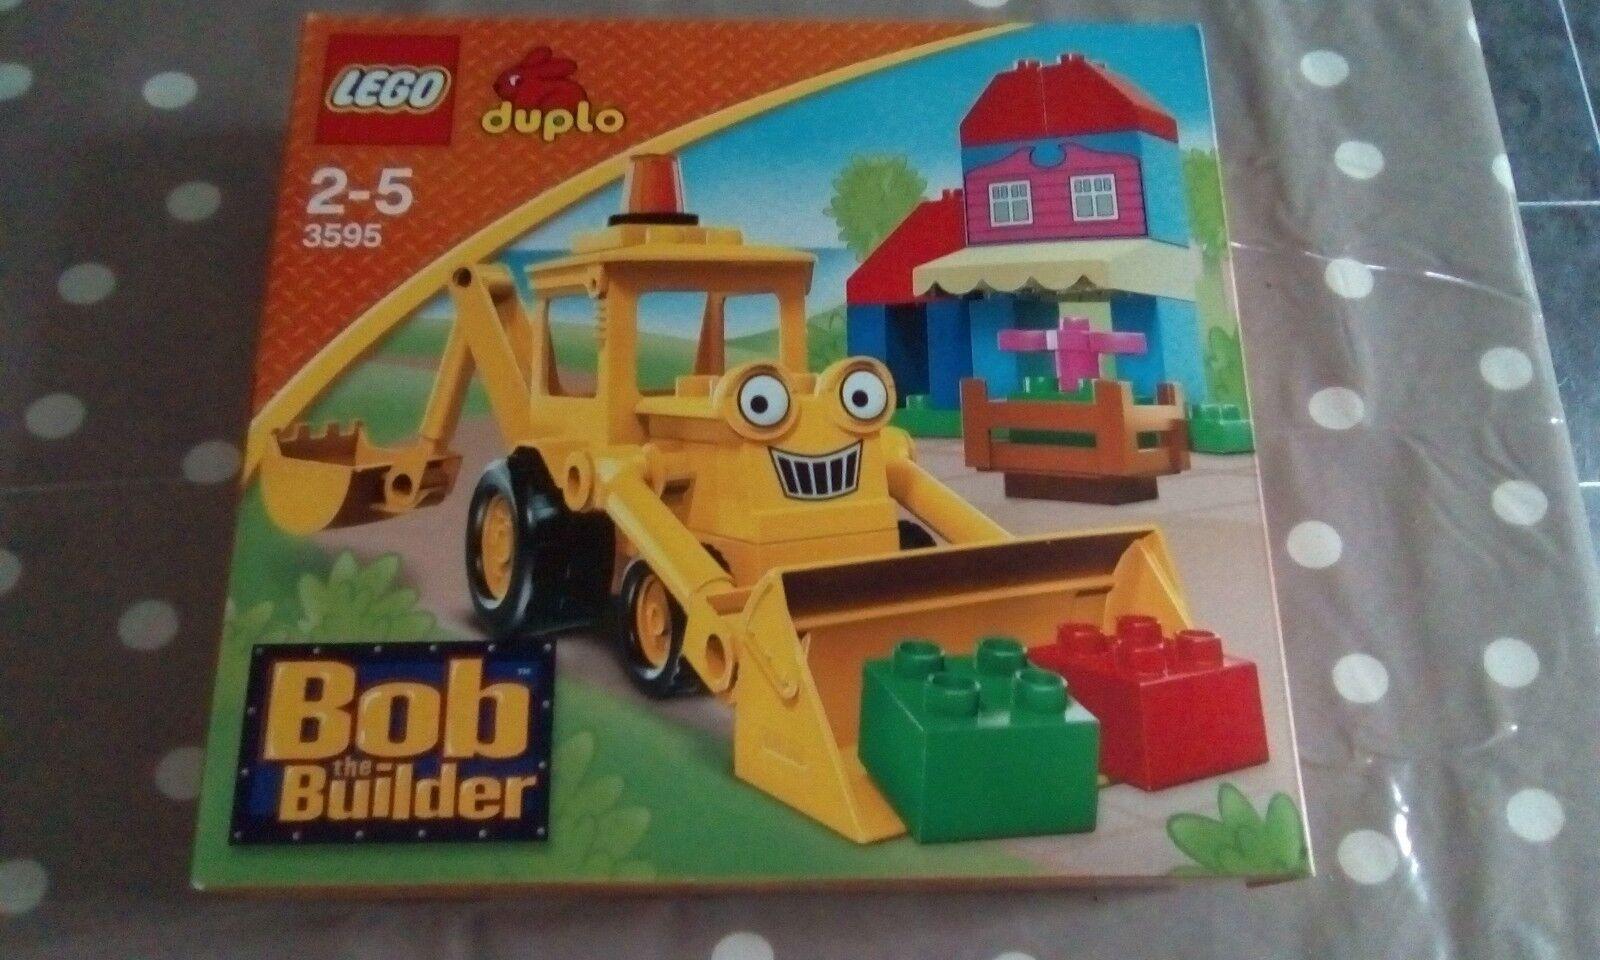 Lego 3595 Bob the Builder duplo Scoop very rare item